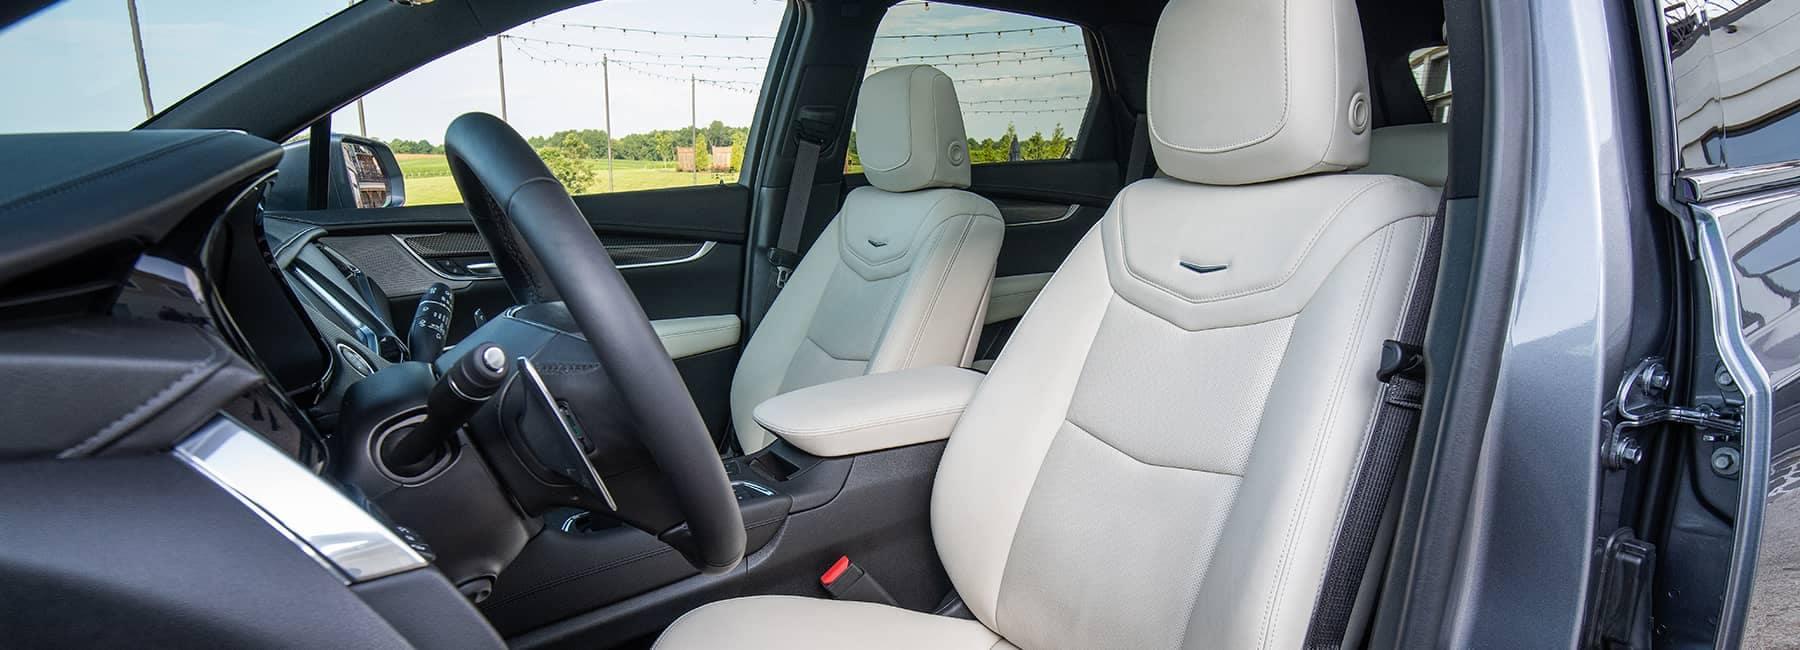 Cadillac leather seats